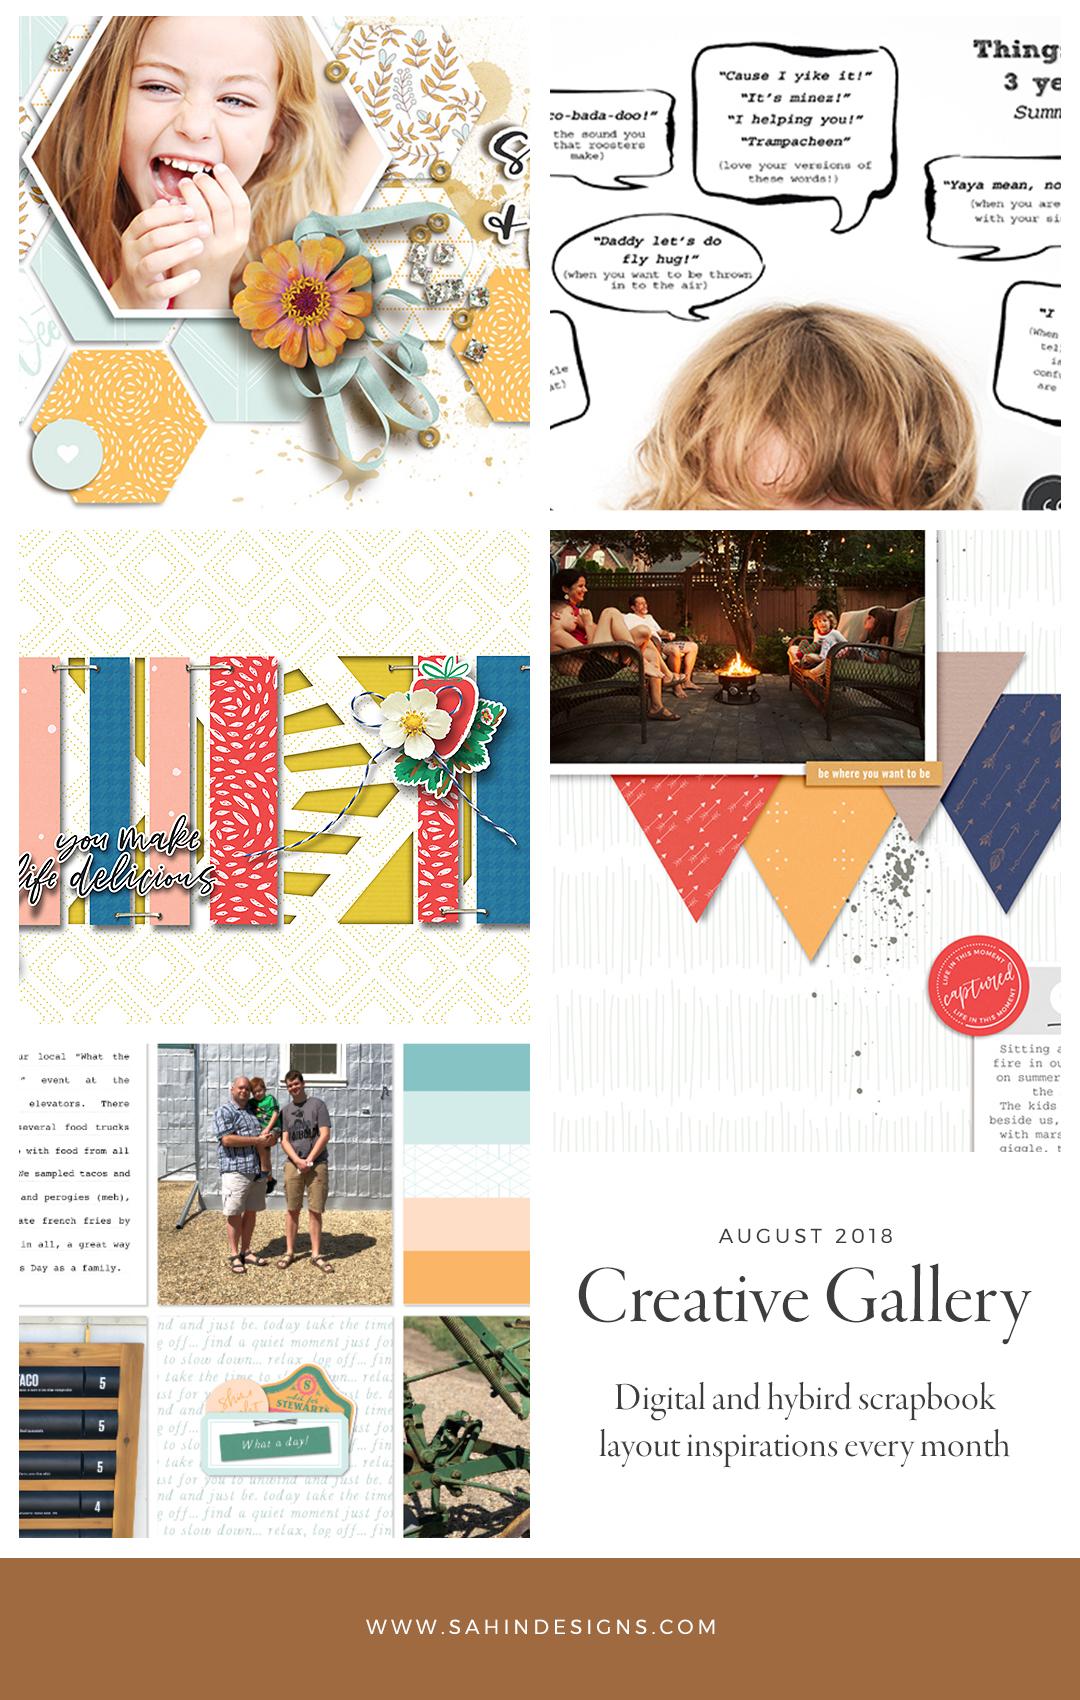 August Creative Scrapbook Gallery 2018 - Sahin Designs